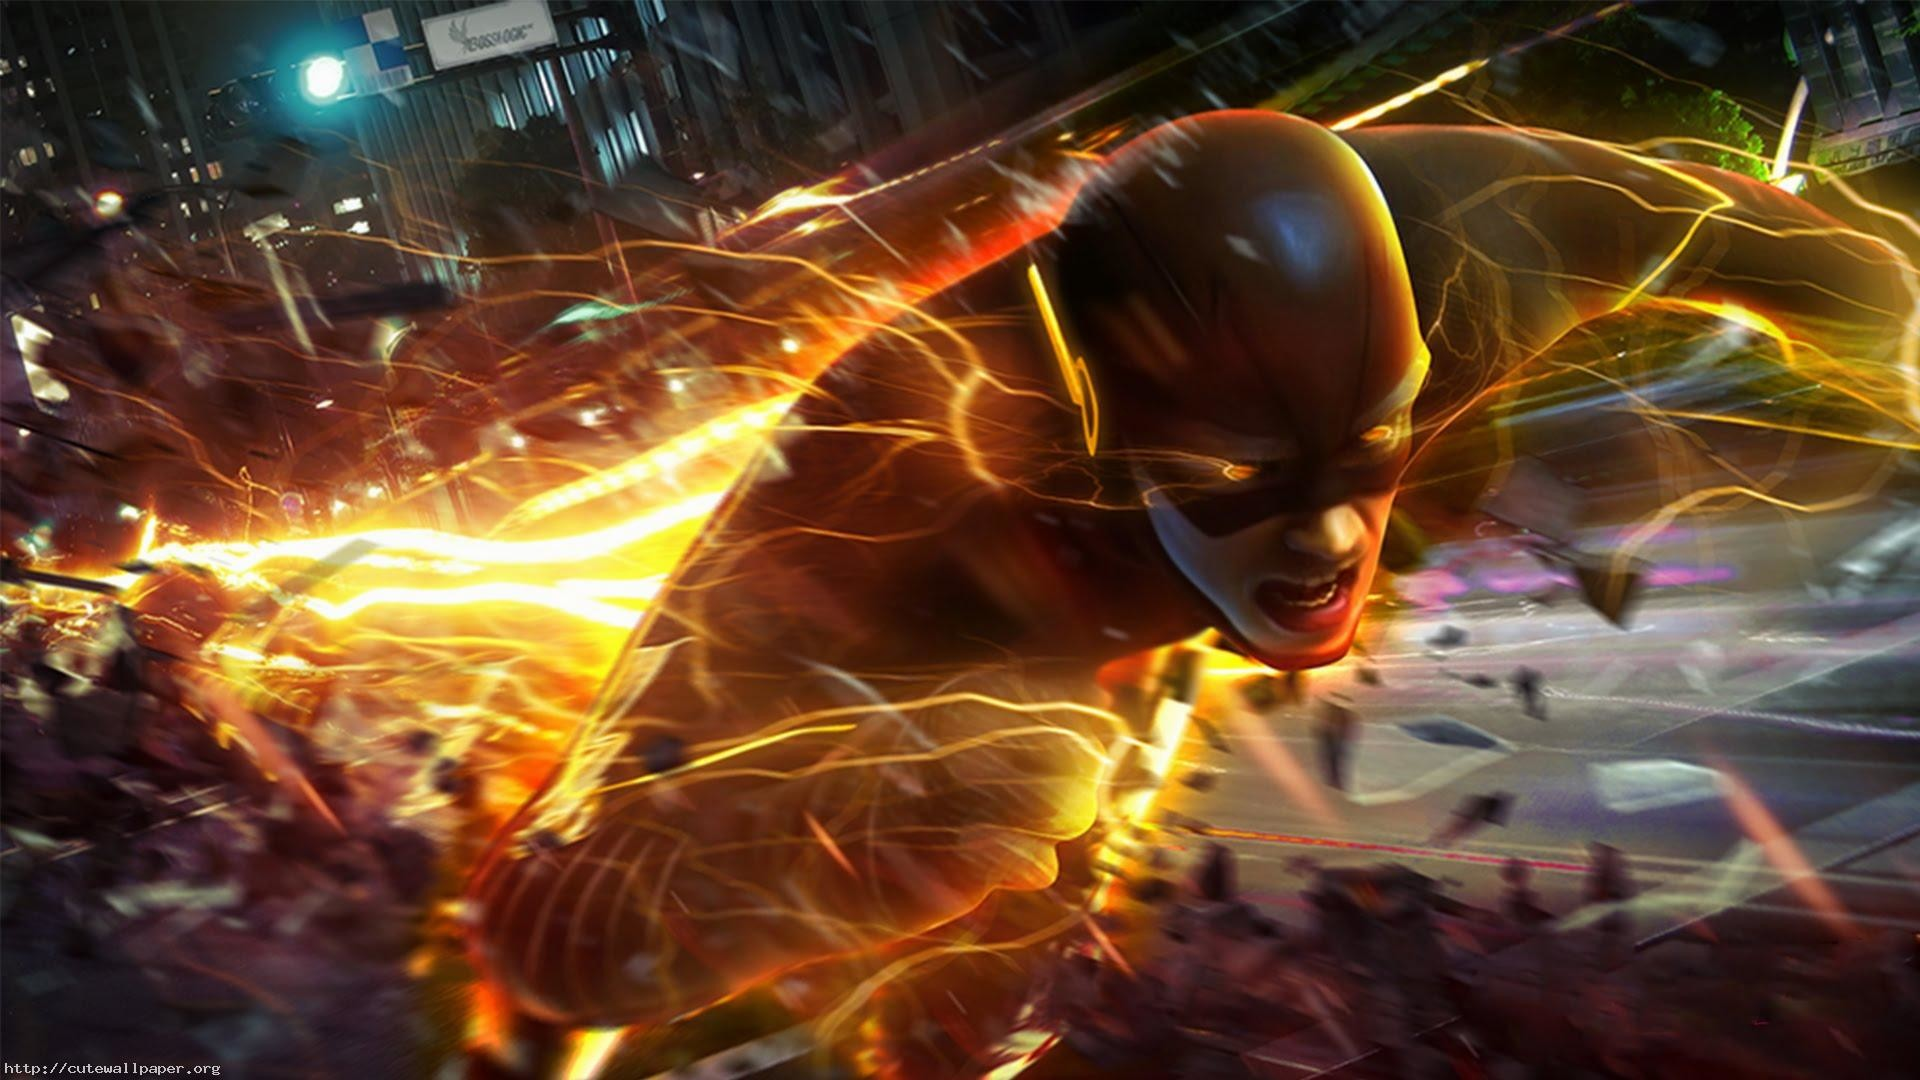 The Flash Wallpaper HD